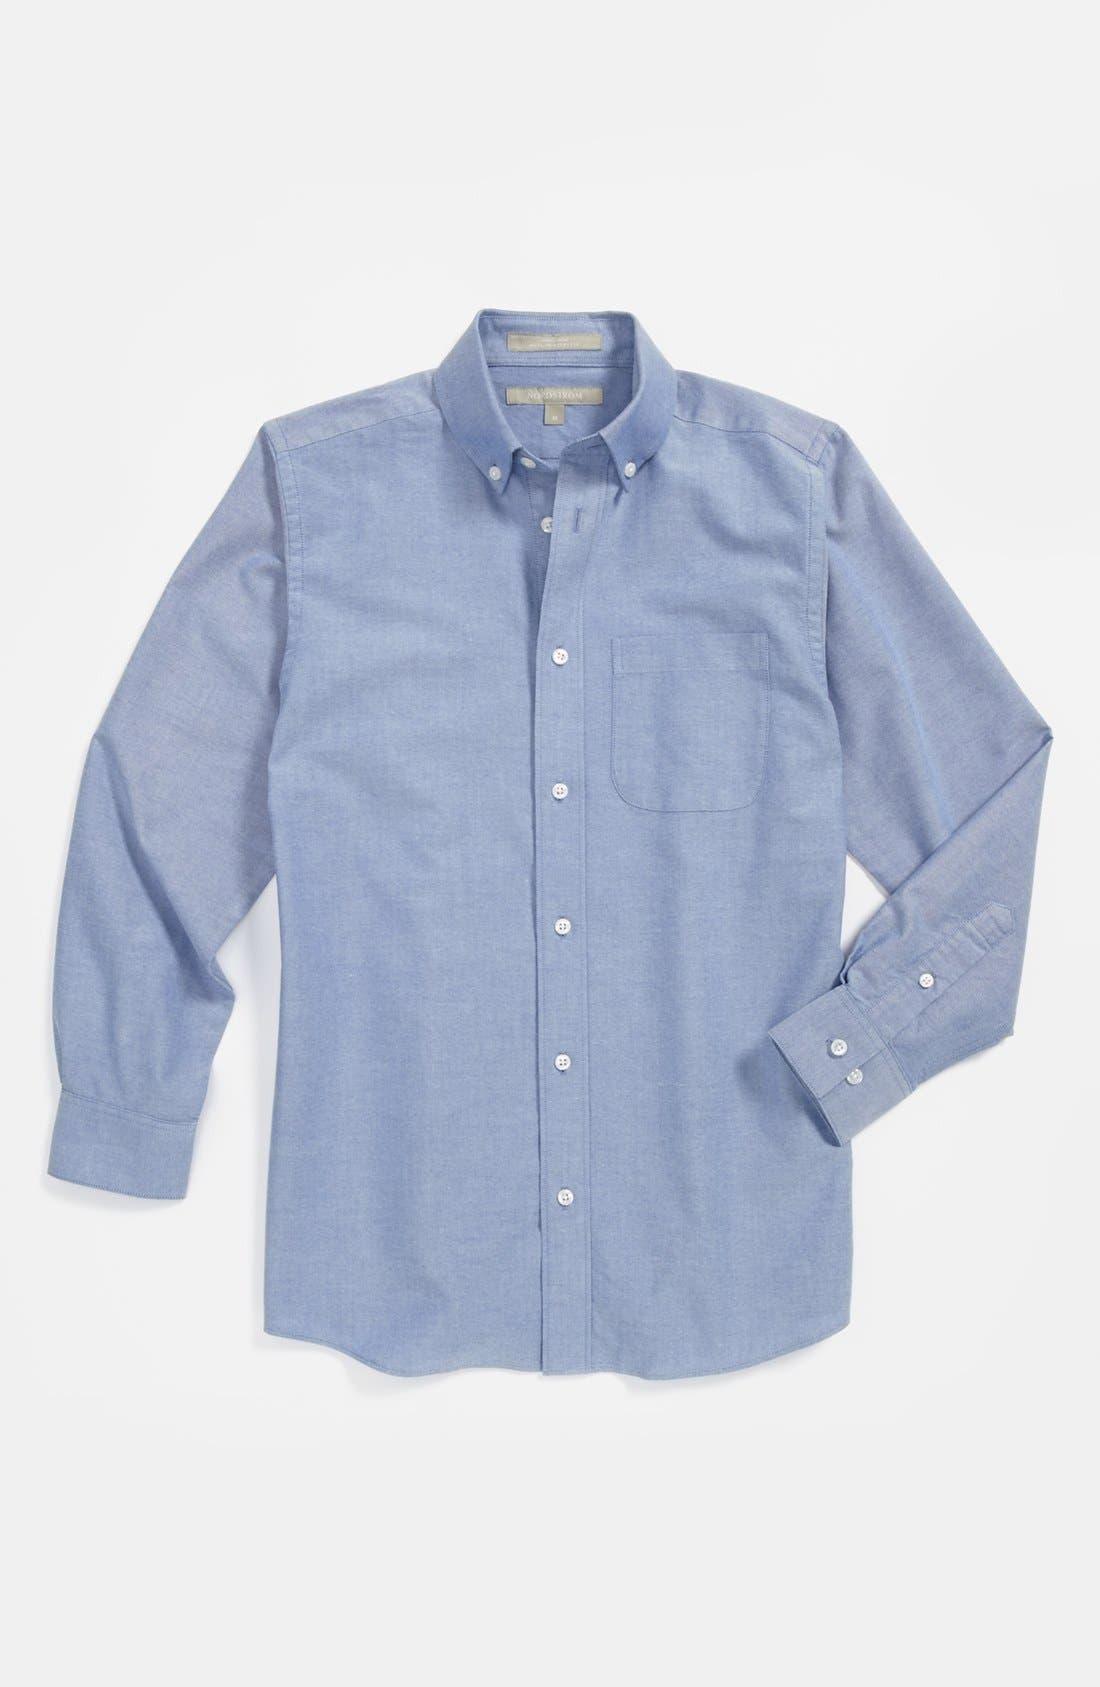 Main Image - Nordstrom 'Michael' Woven Oxford Shirt (Little Boys & Big Boys)